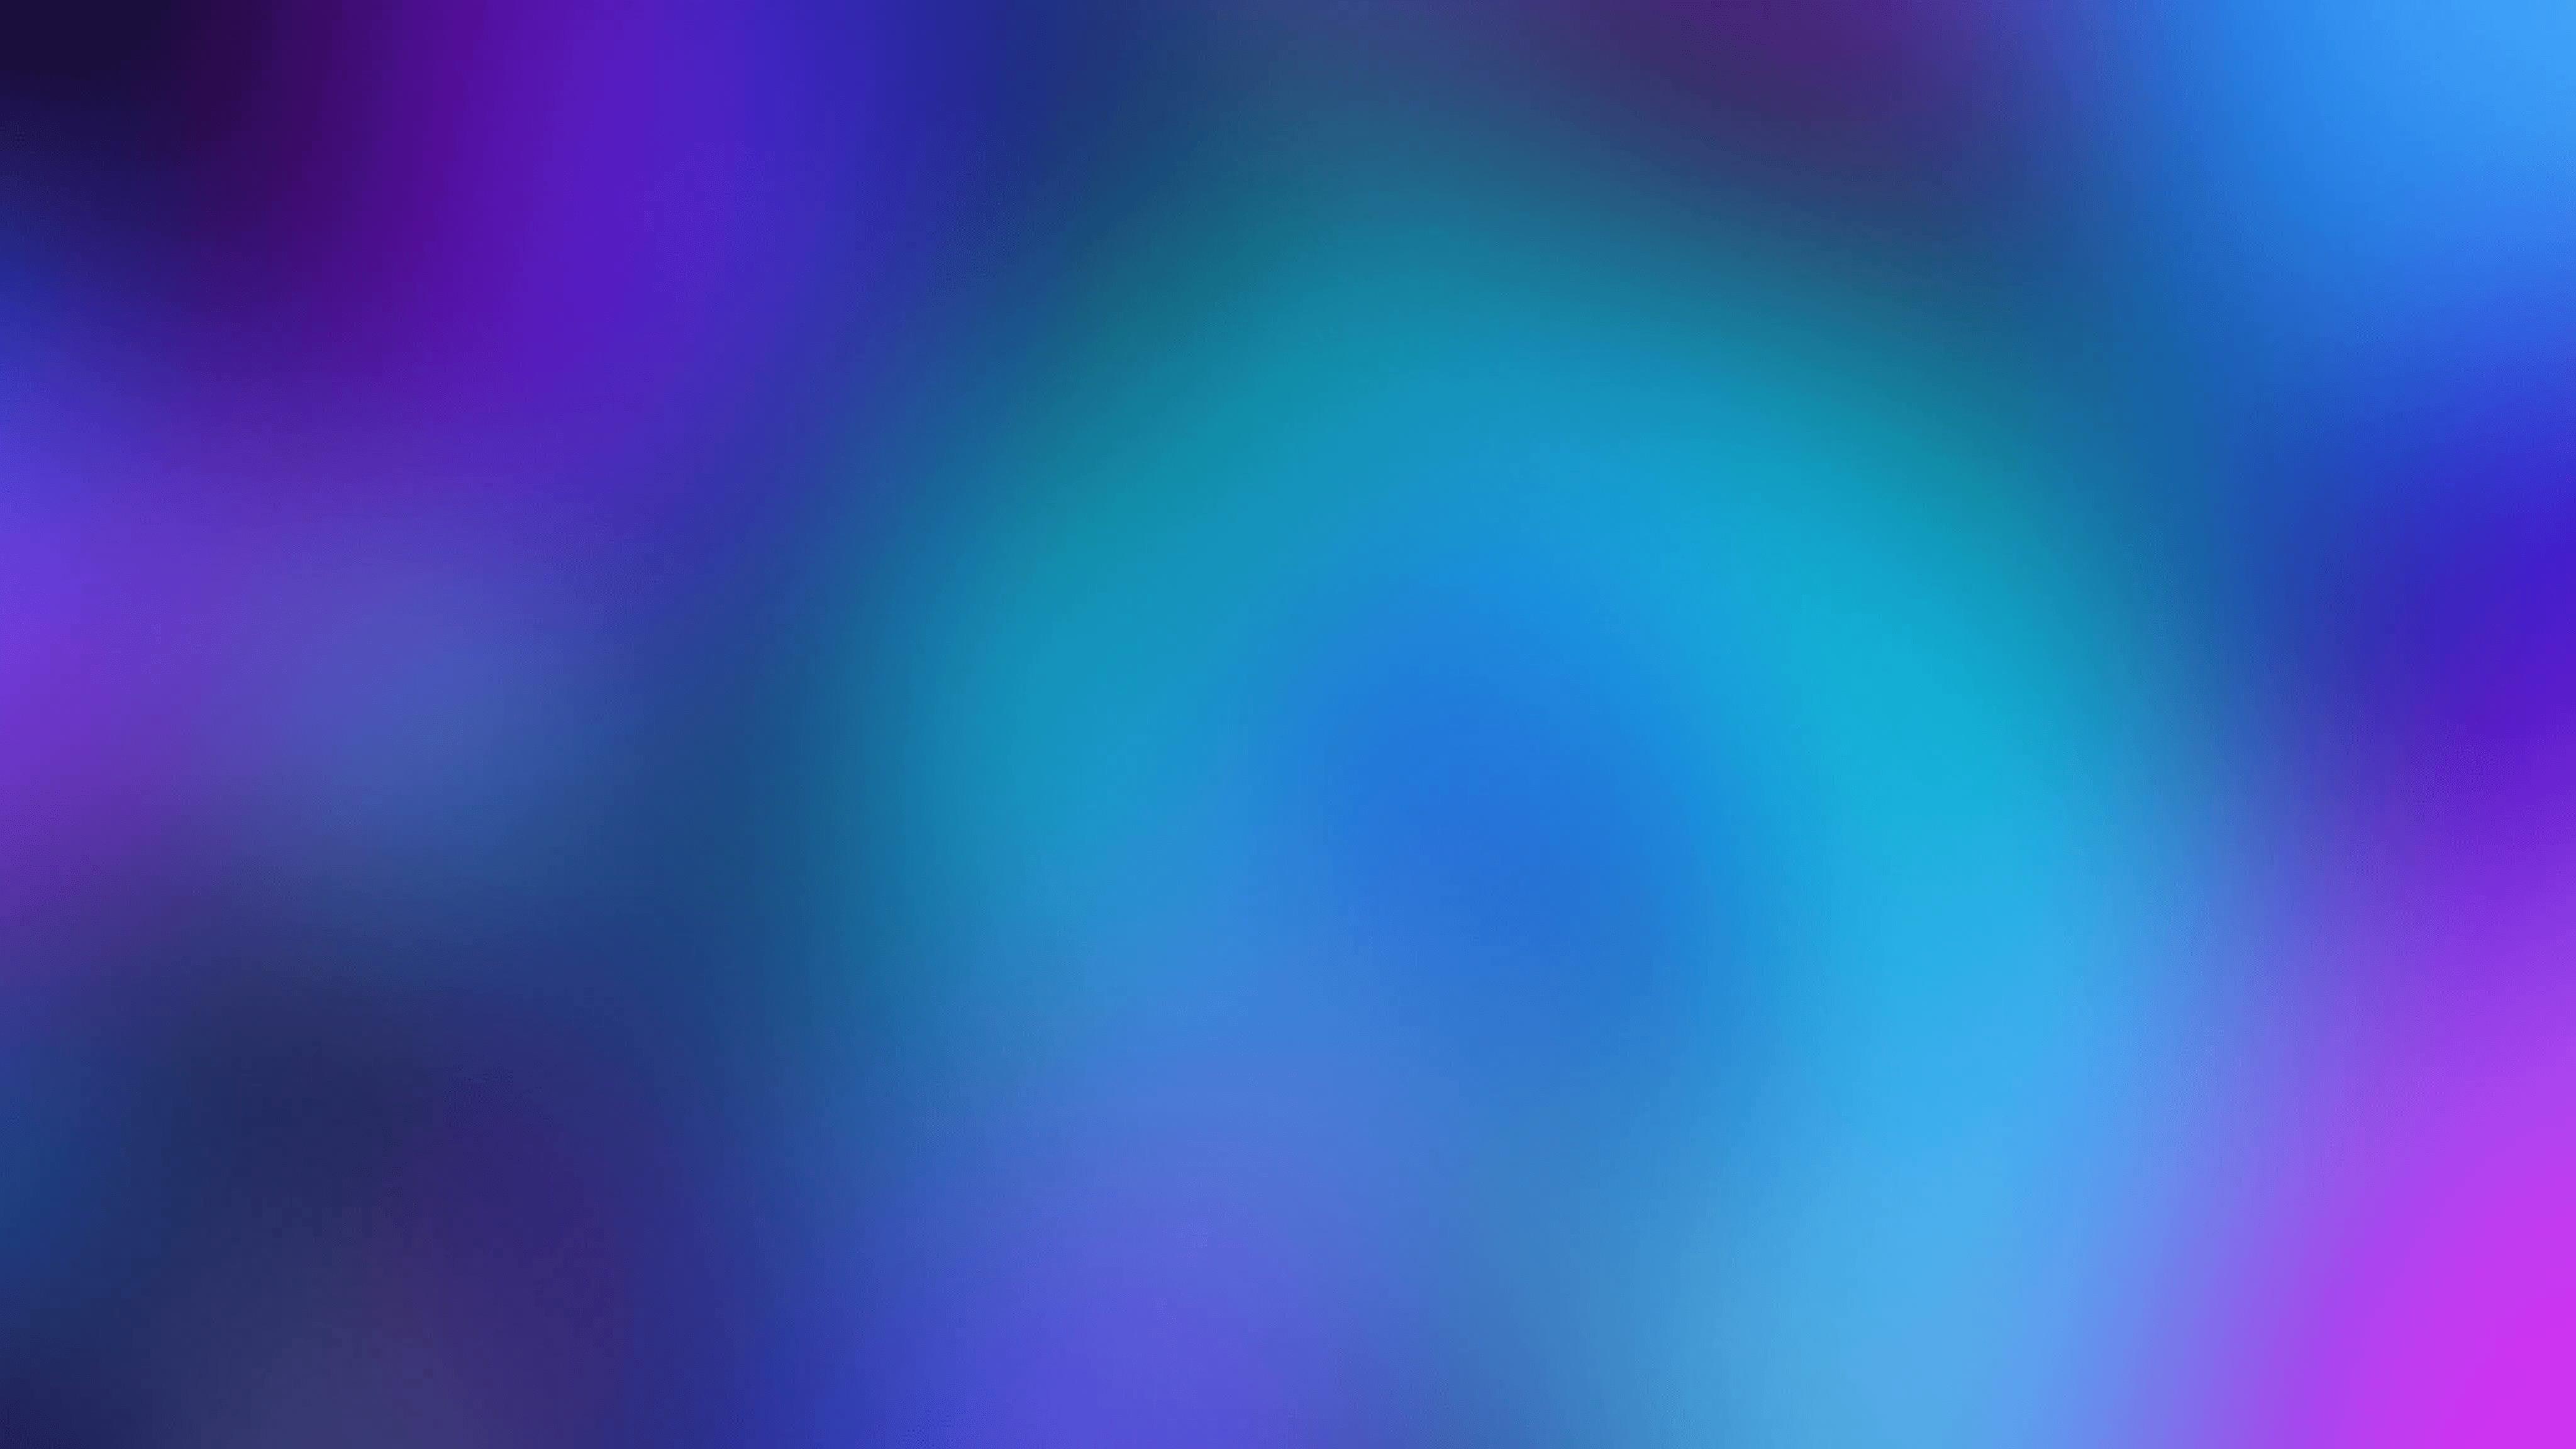 Unduh 104 Background Blue Hd Image HD Terbaik